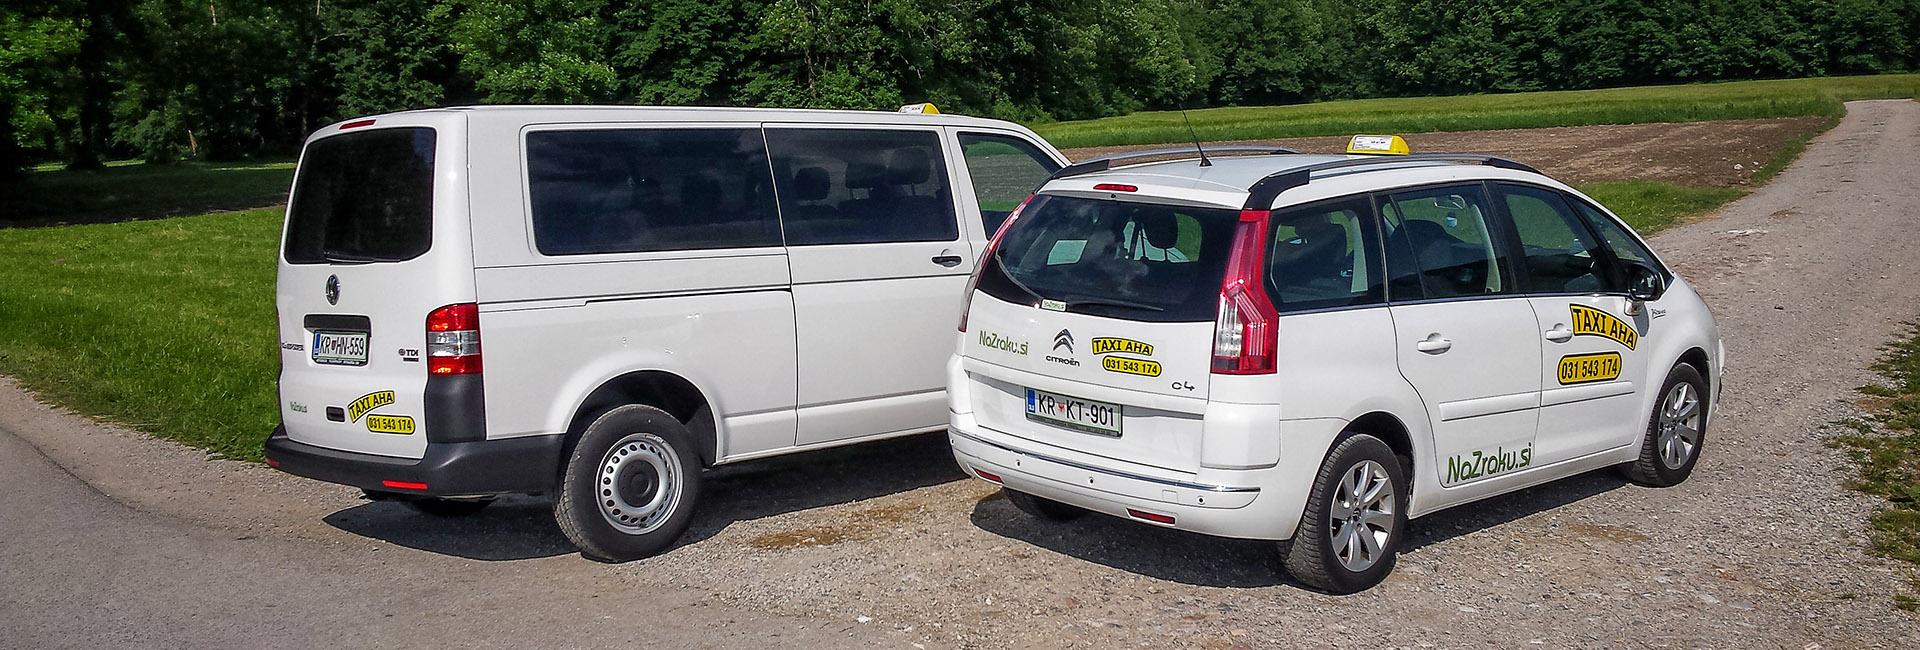 Taxi-AHA-vozni-park_2